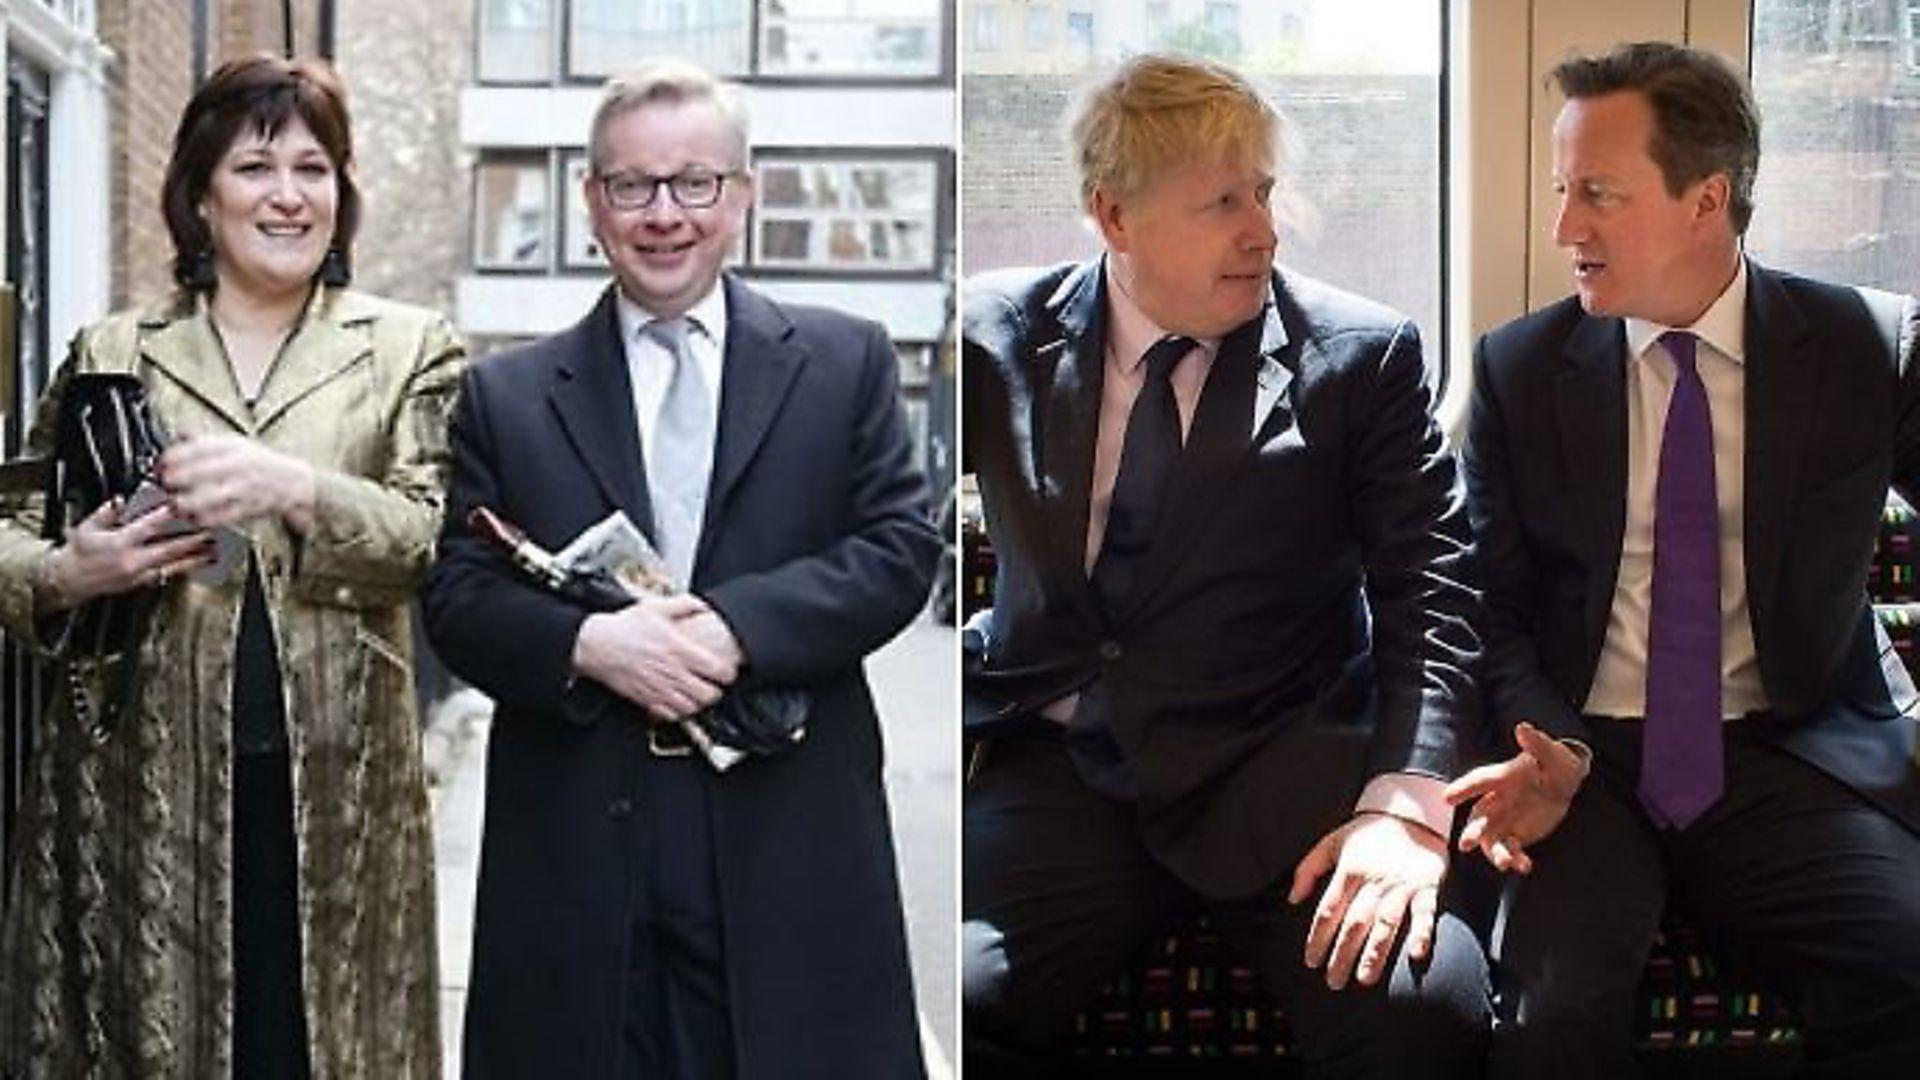 Sarah Vine, Michael Gove, Boris Johnson and David Cameron. Photographs: PA. - Credit: Archant